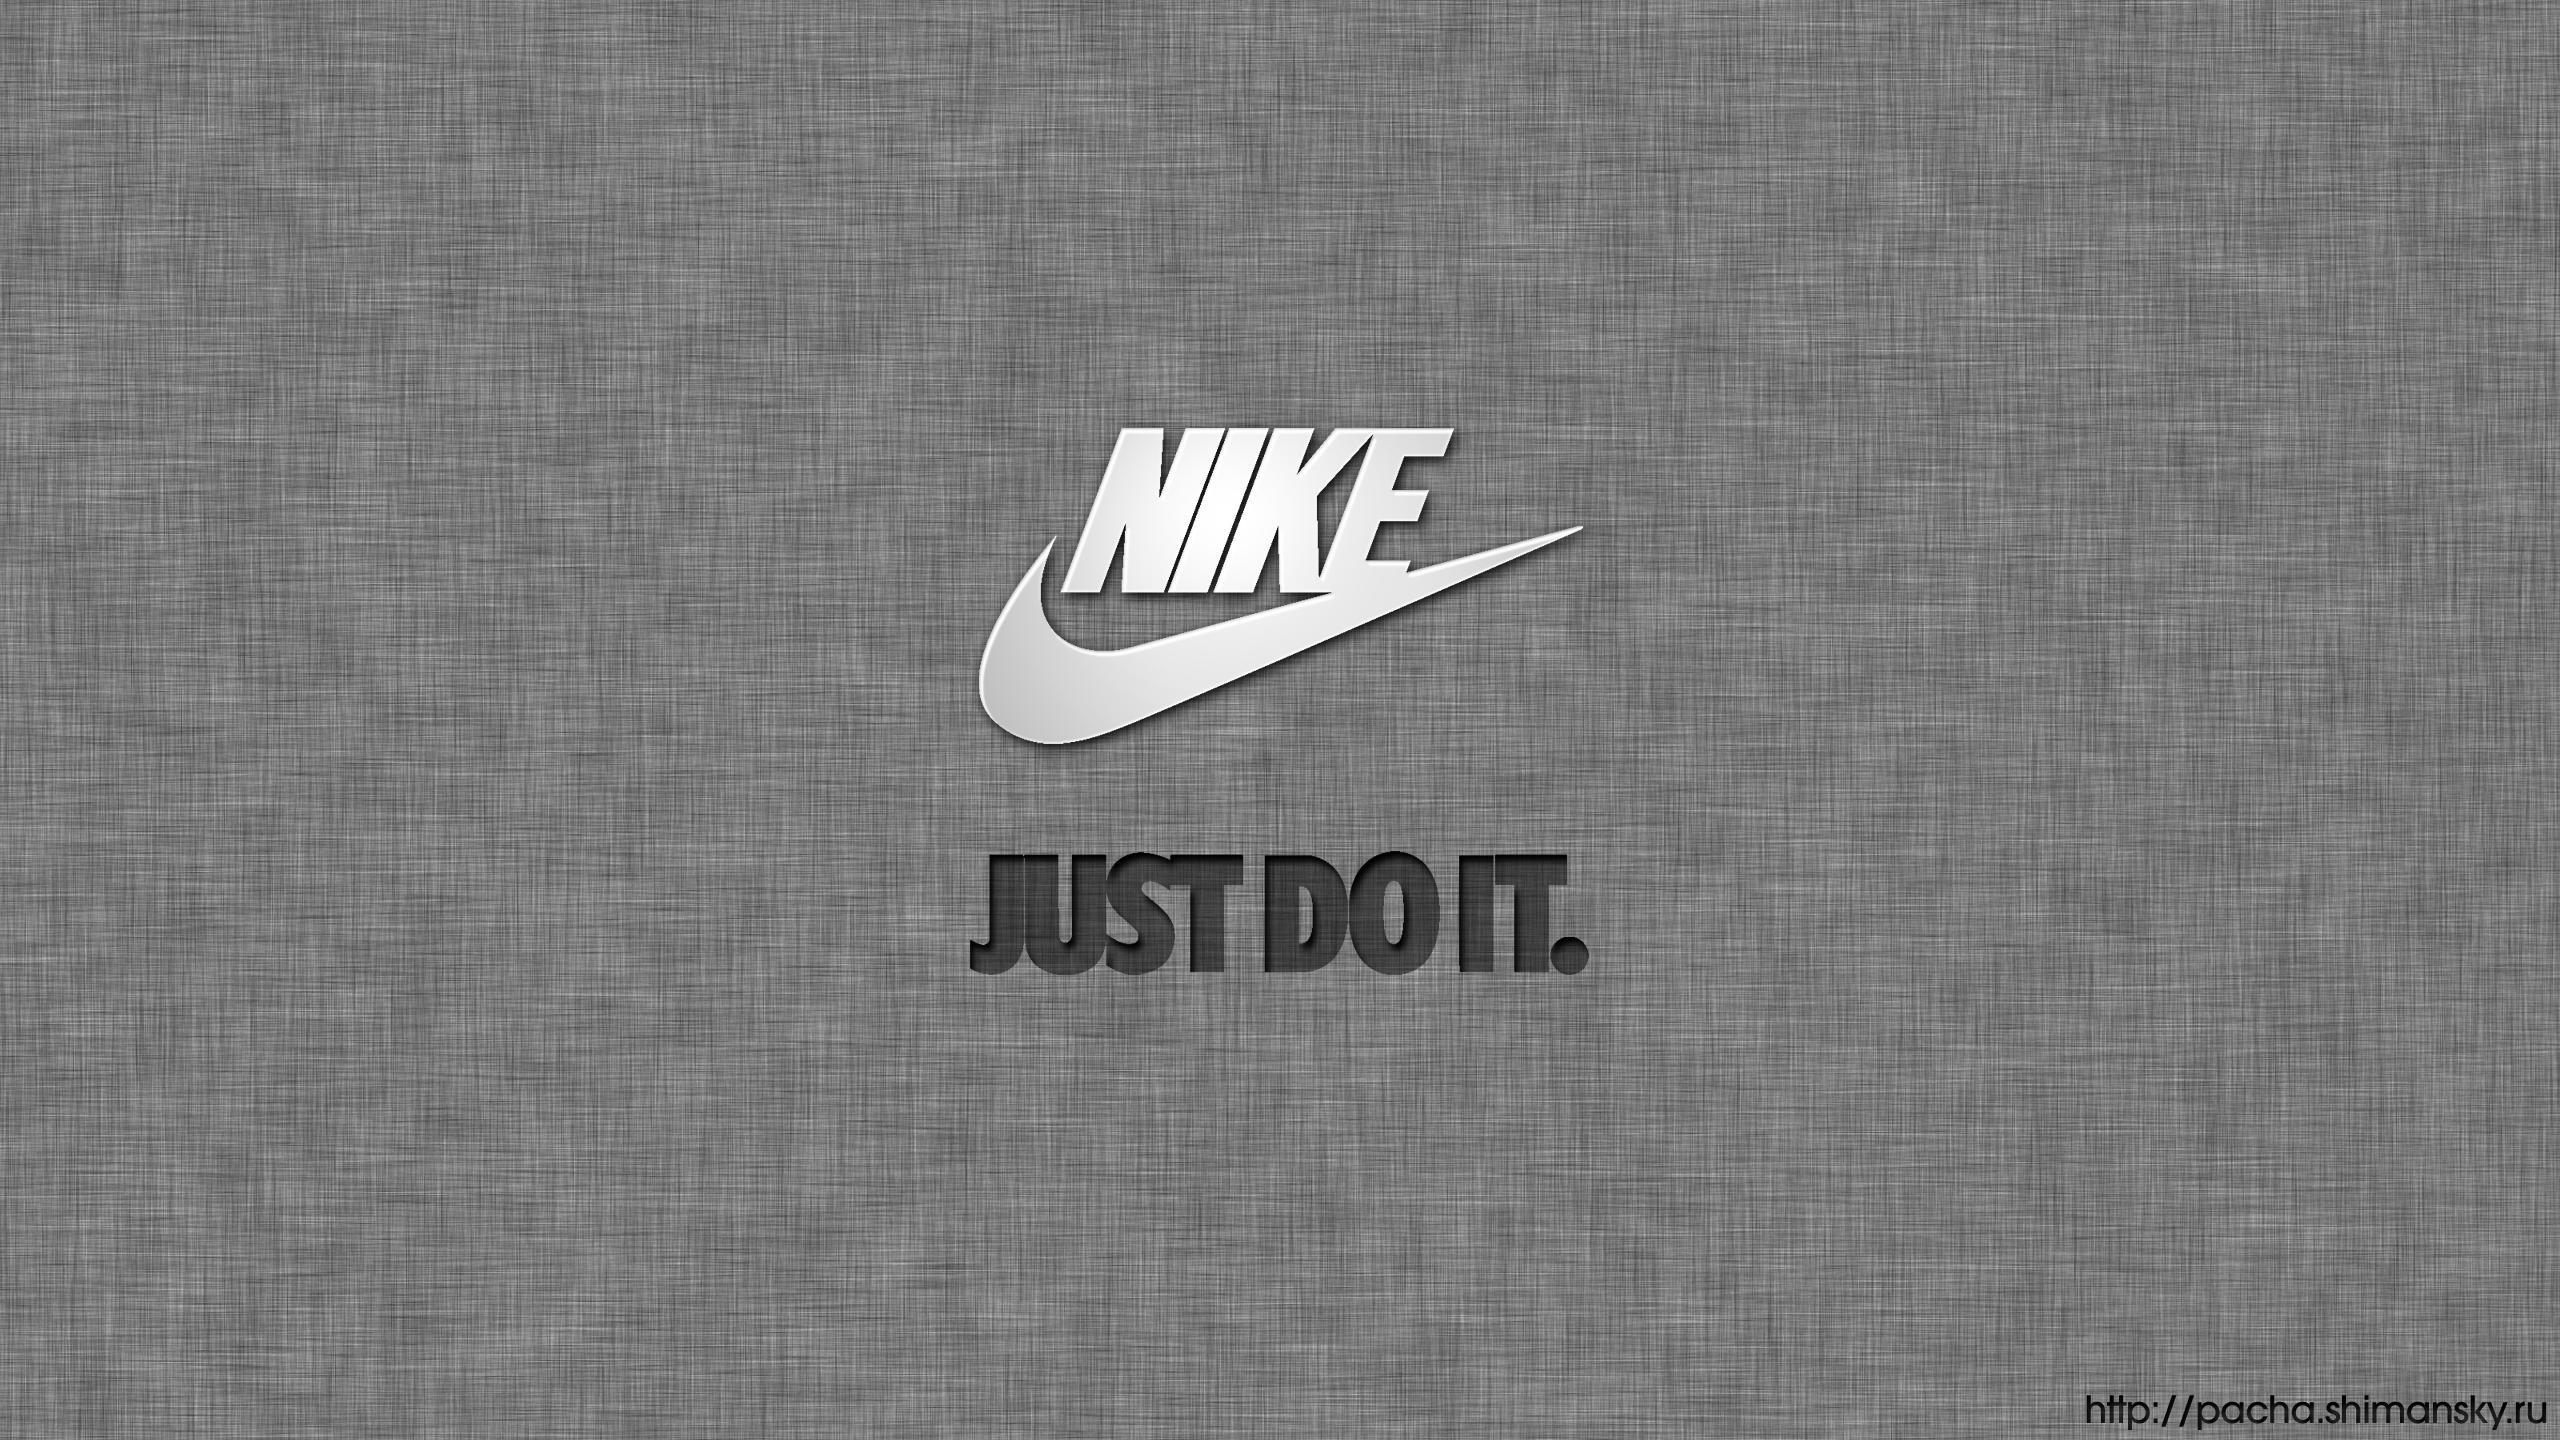 Res: 2560x1440, Nike Logo Wallpapers HD 2015 free download | PixelsTalk Net